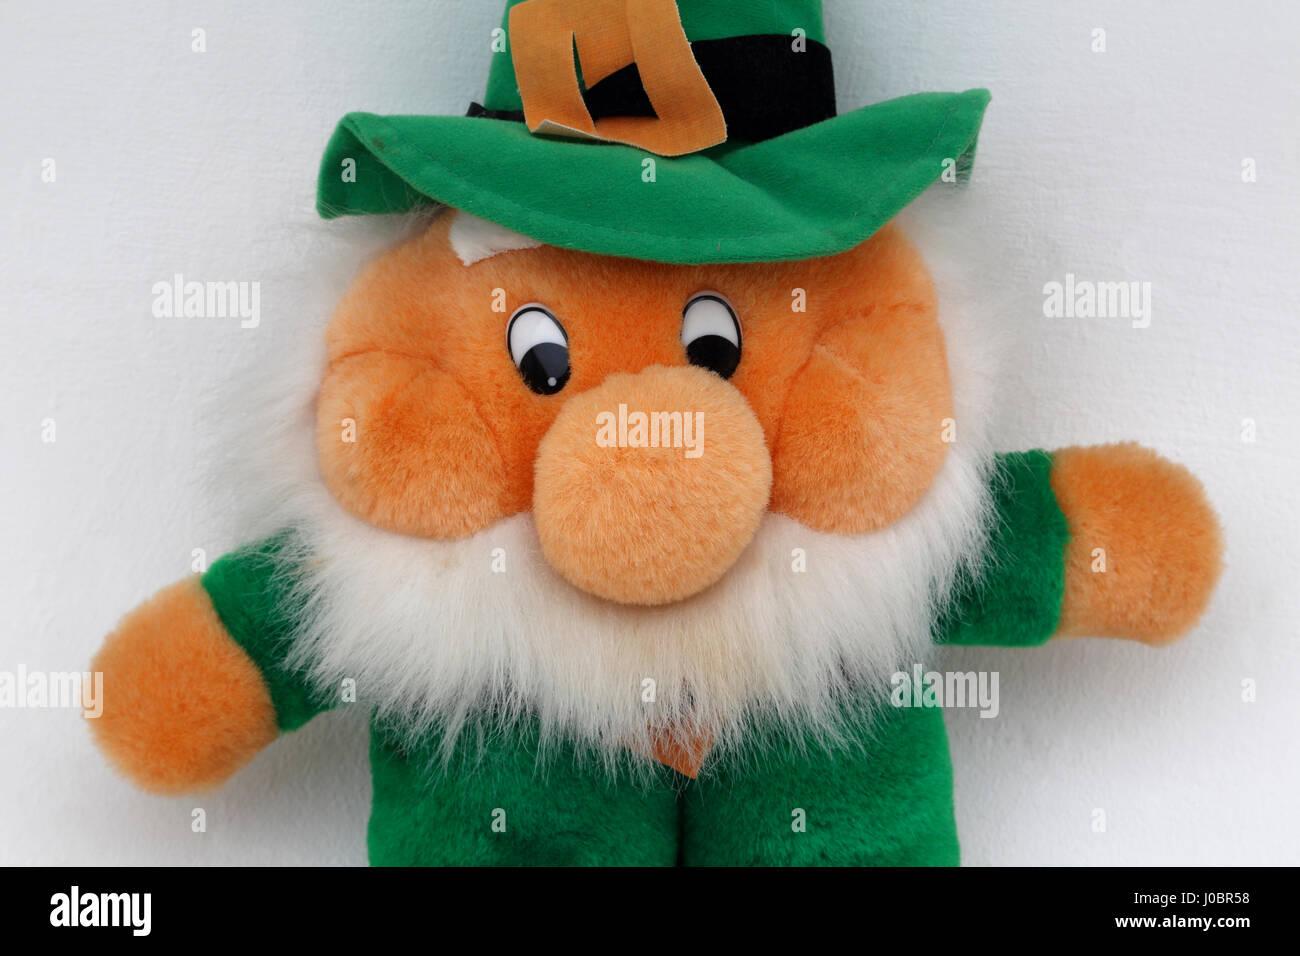 Leprechaun Toy Stock Photo